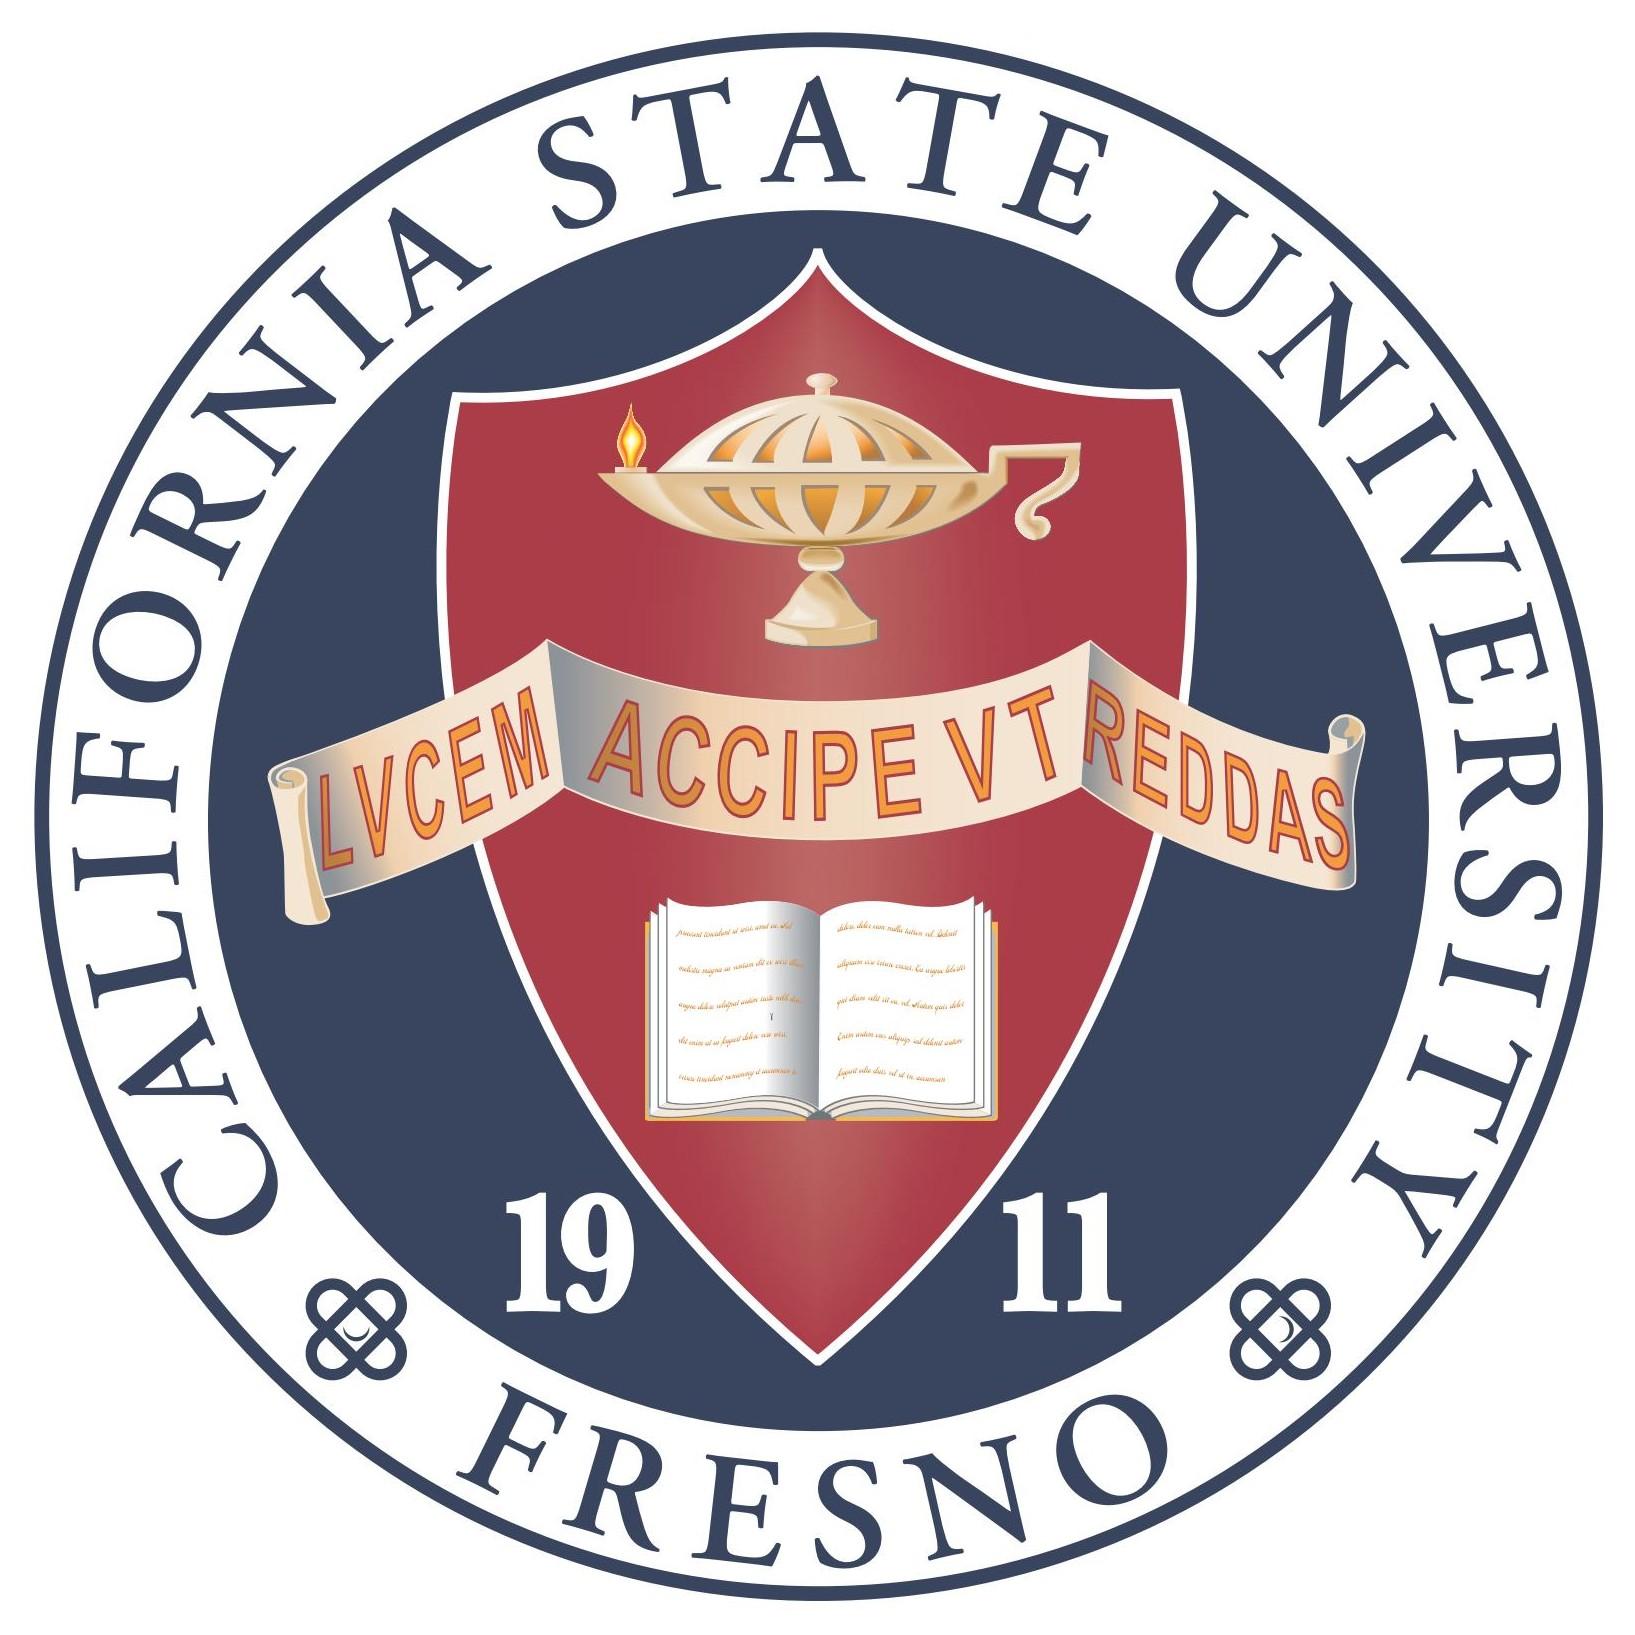 Fresno state clipart logo jpg png royalty free download Cal State Fresno Clip Art – Clipart Free Download png royalty free download